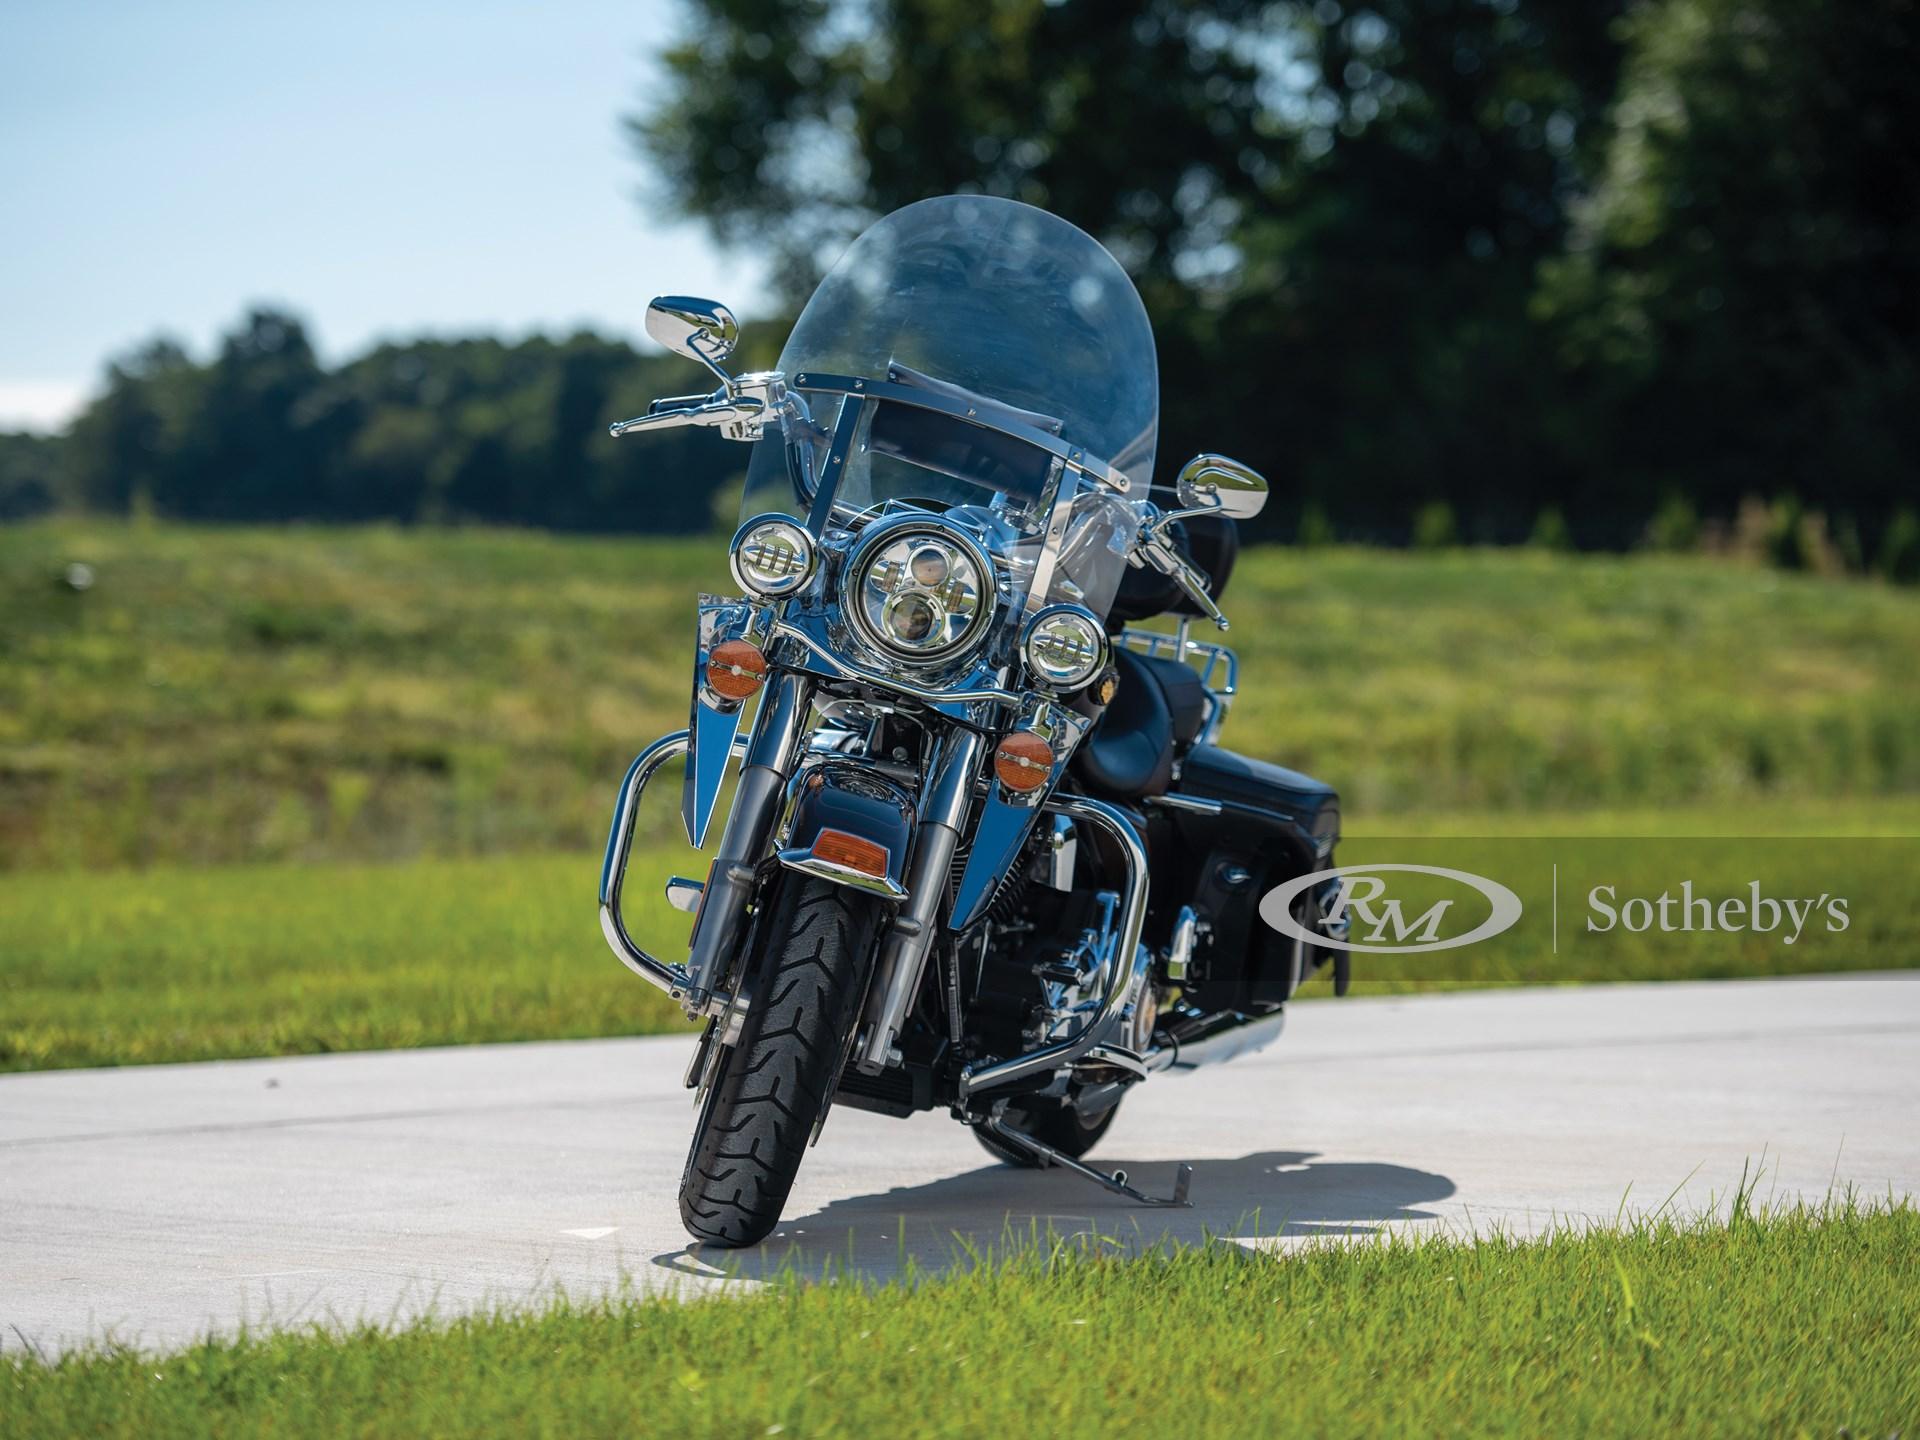 2013 Harley-Davidson Road King 110th Anniversary  -